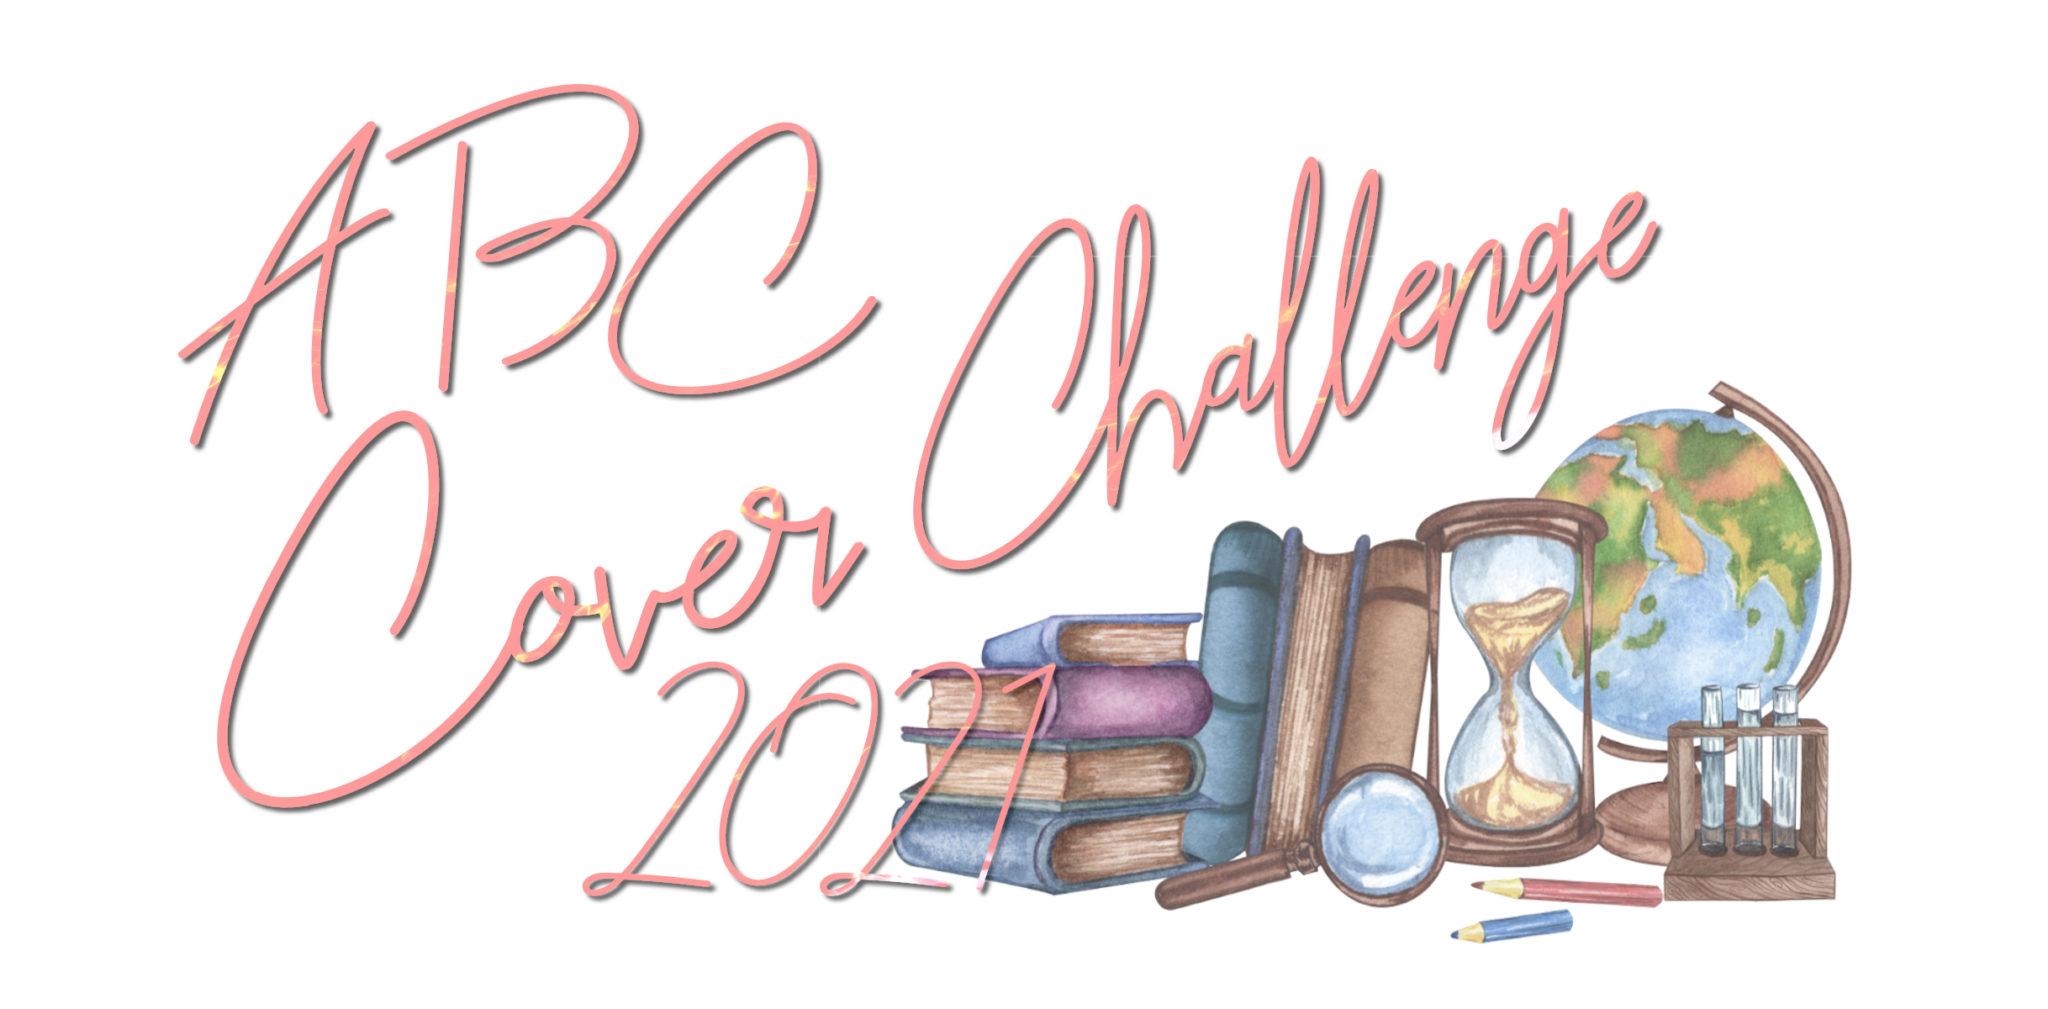 Challenge Image 3